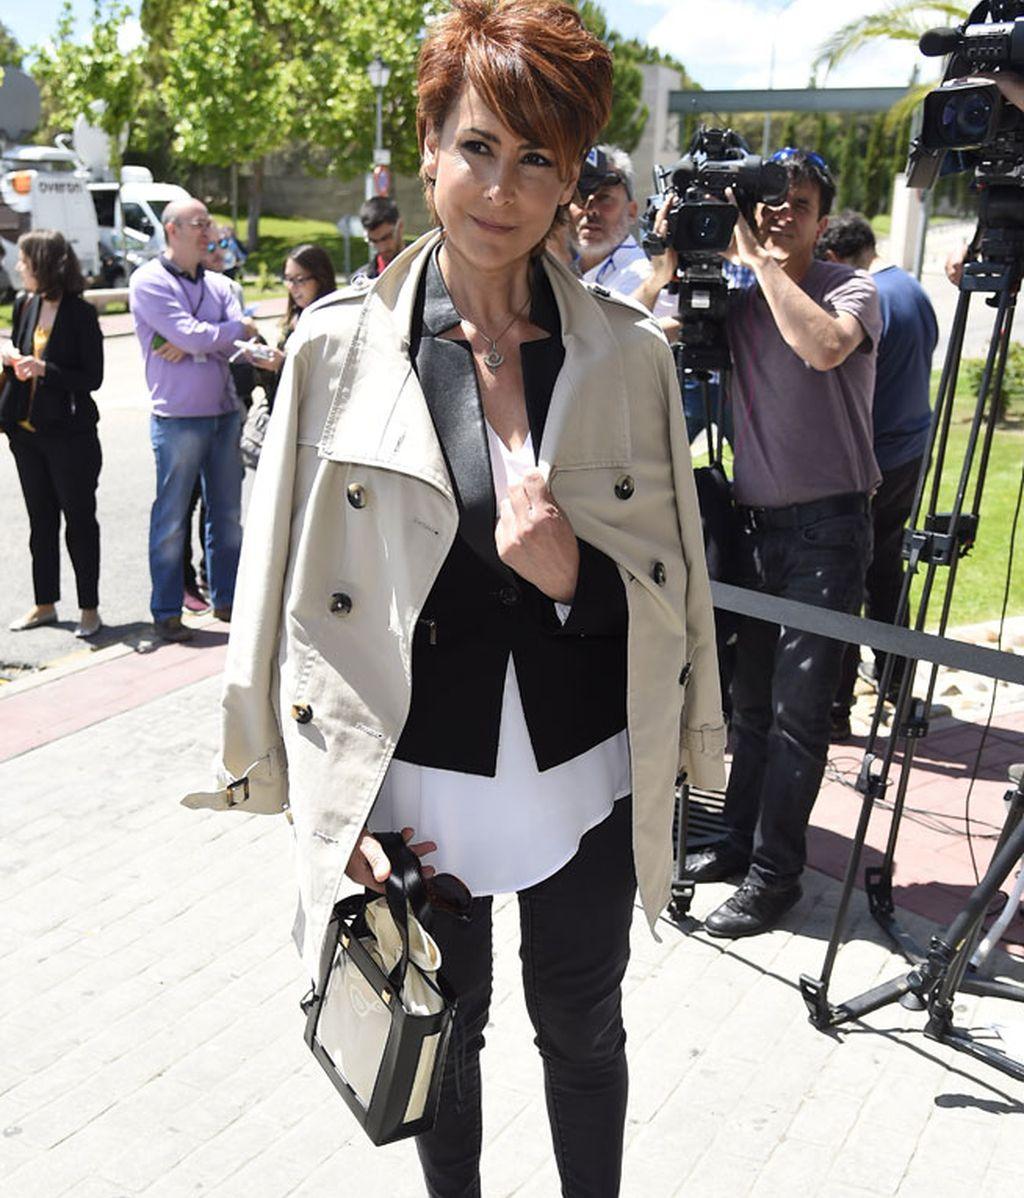 La presentadora Irma Soriano